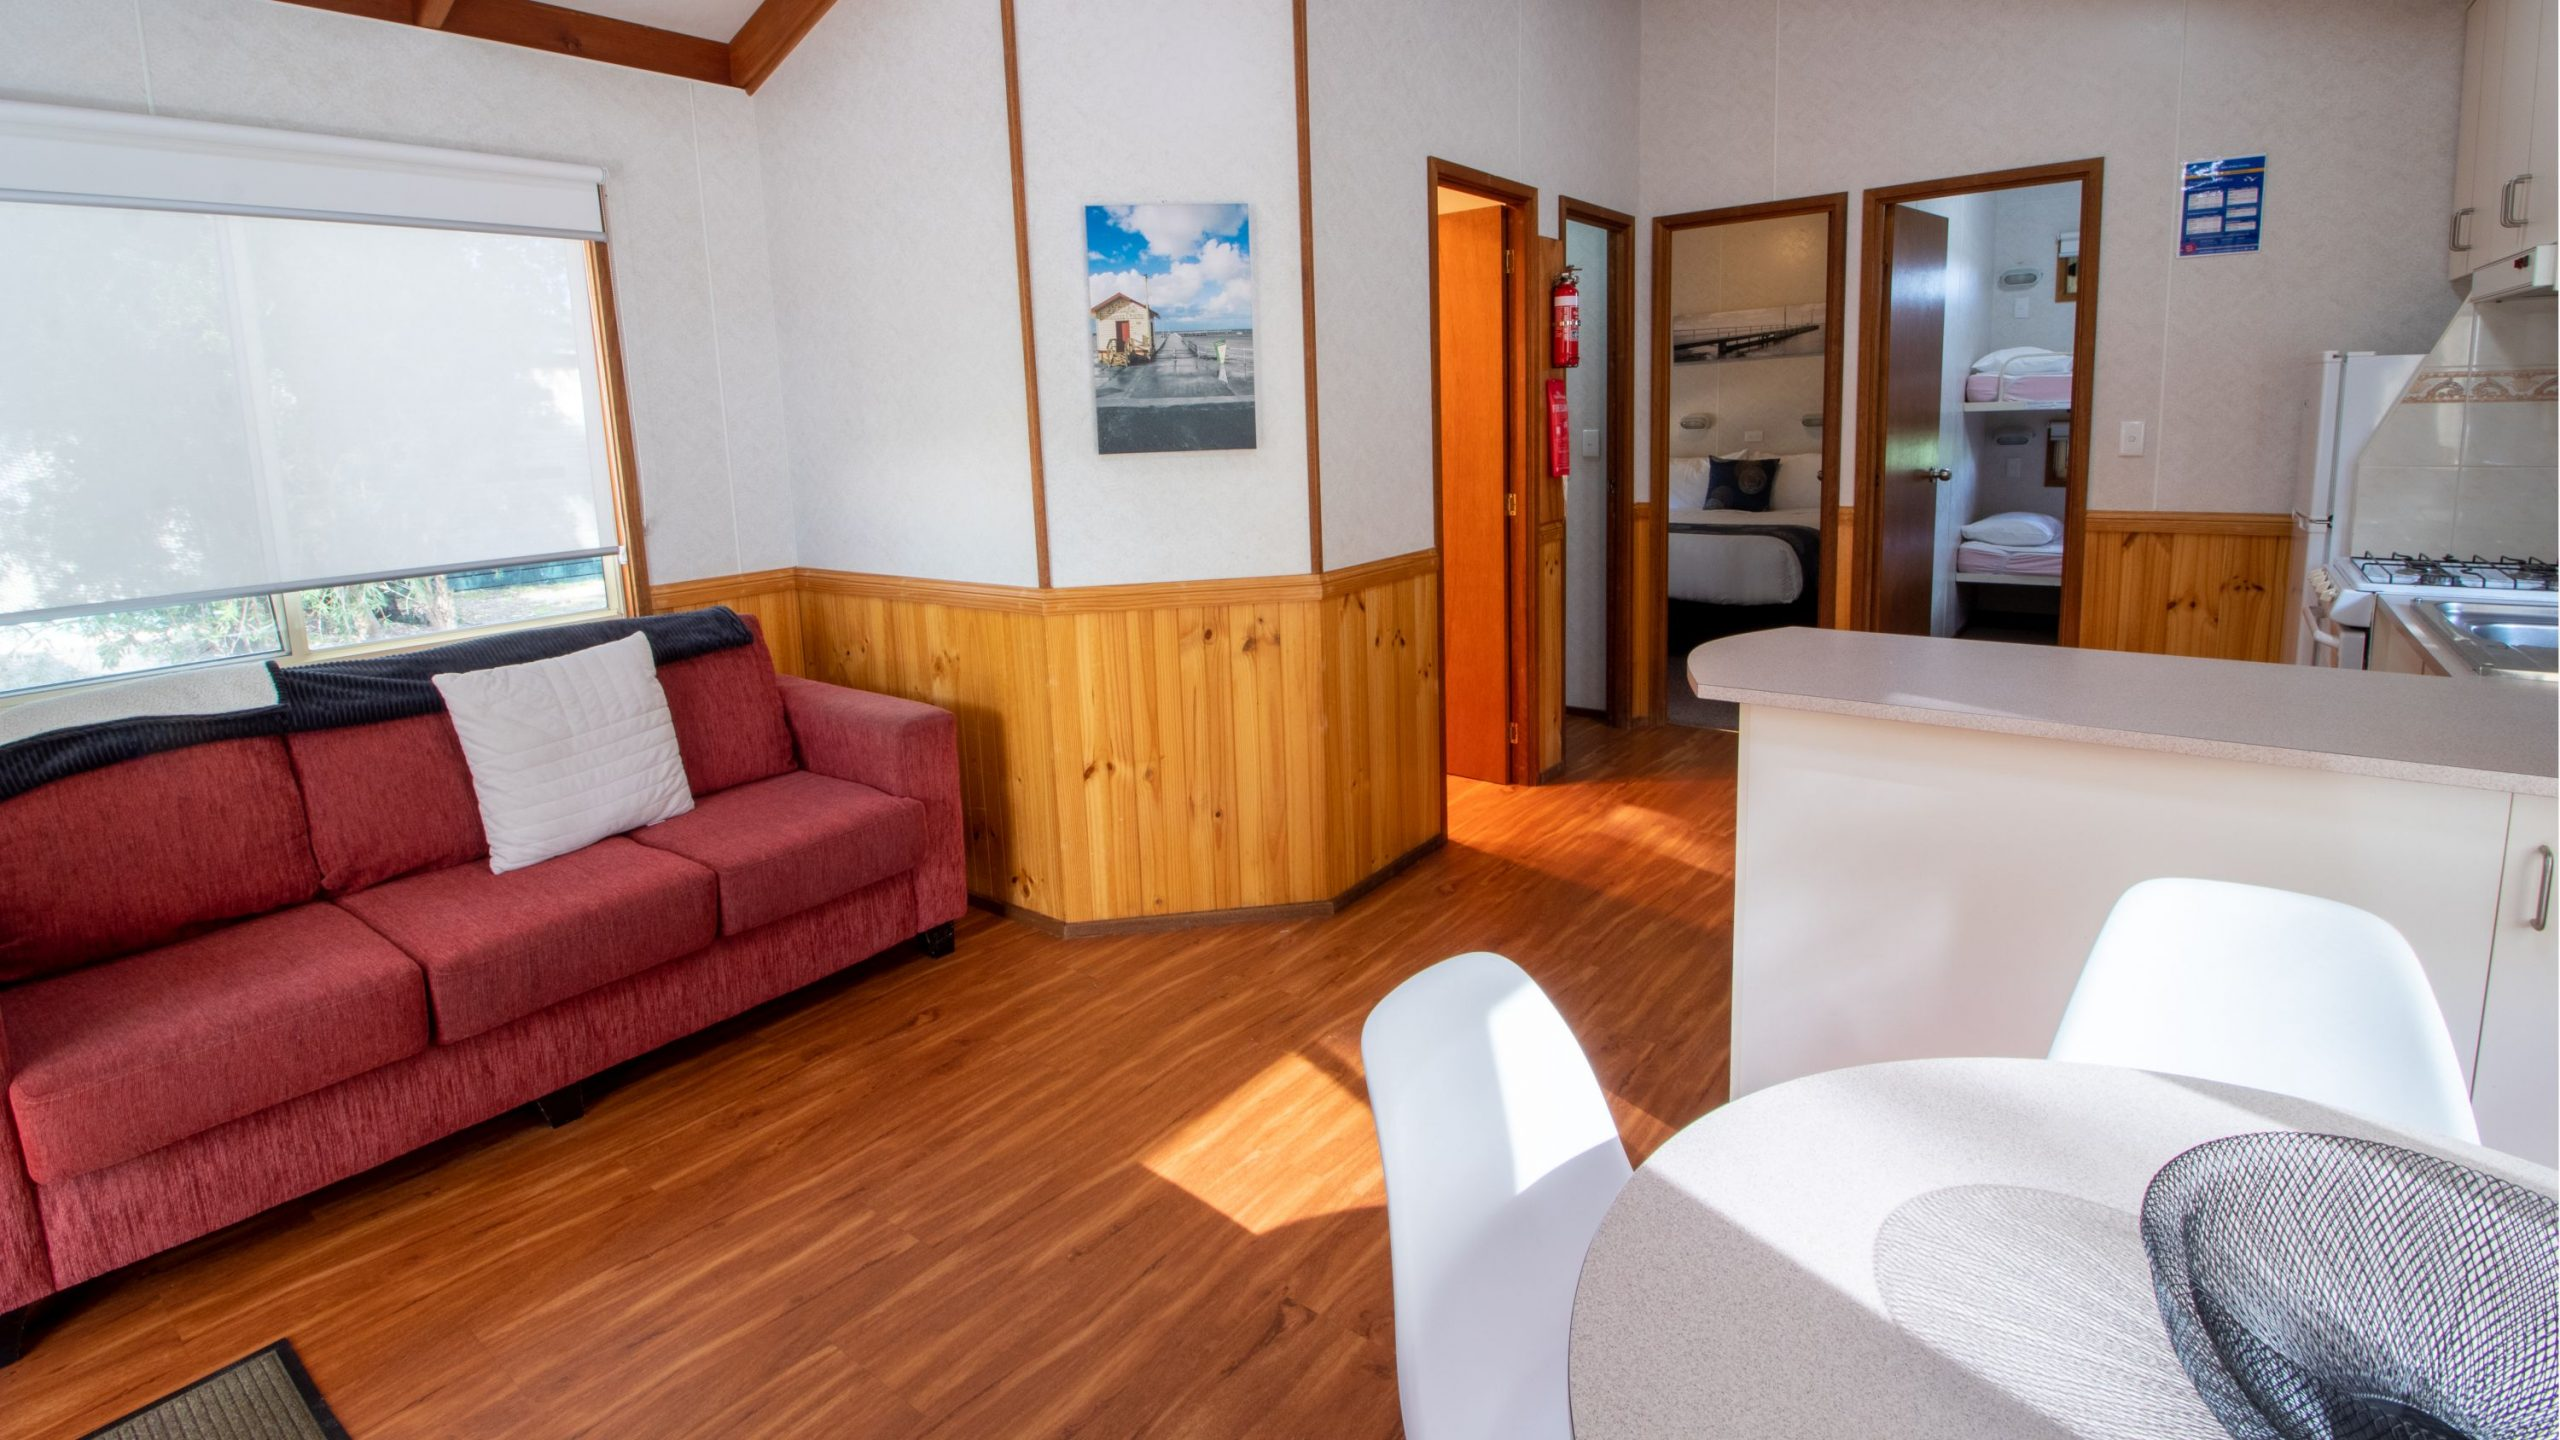 Deluxe Cabin internal